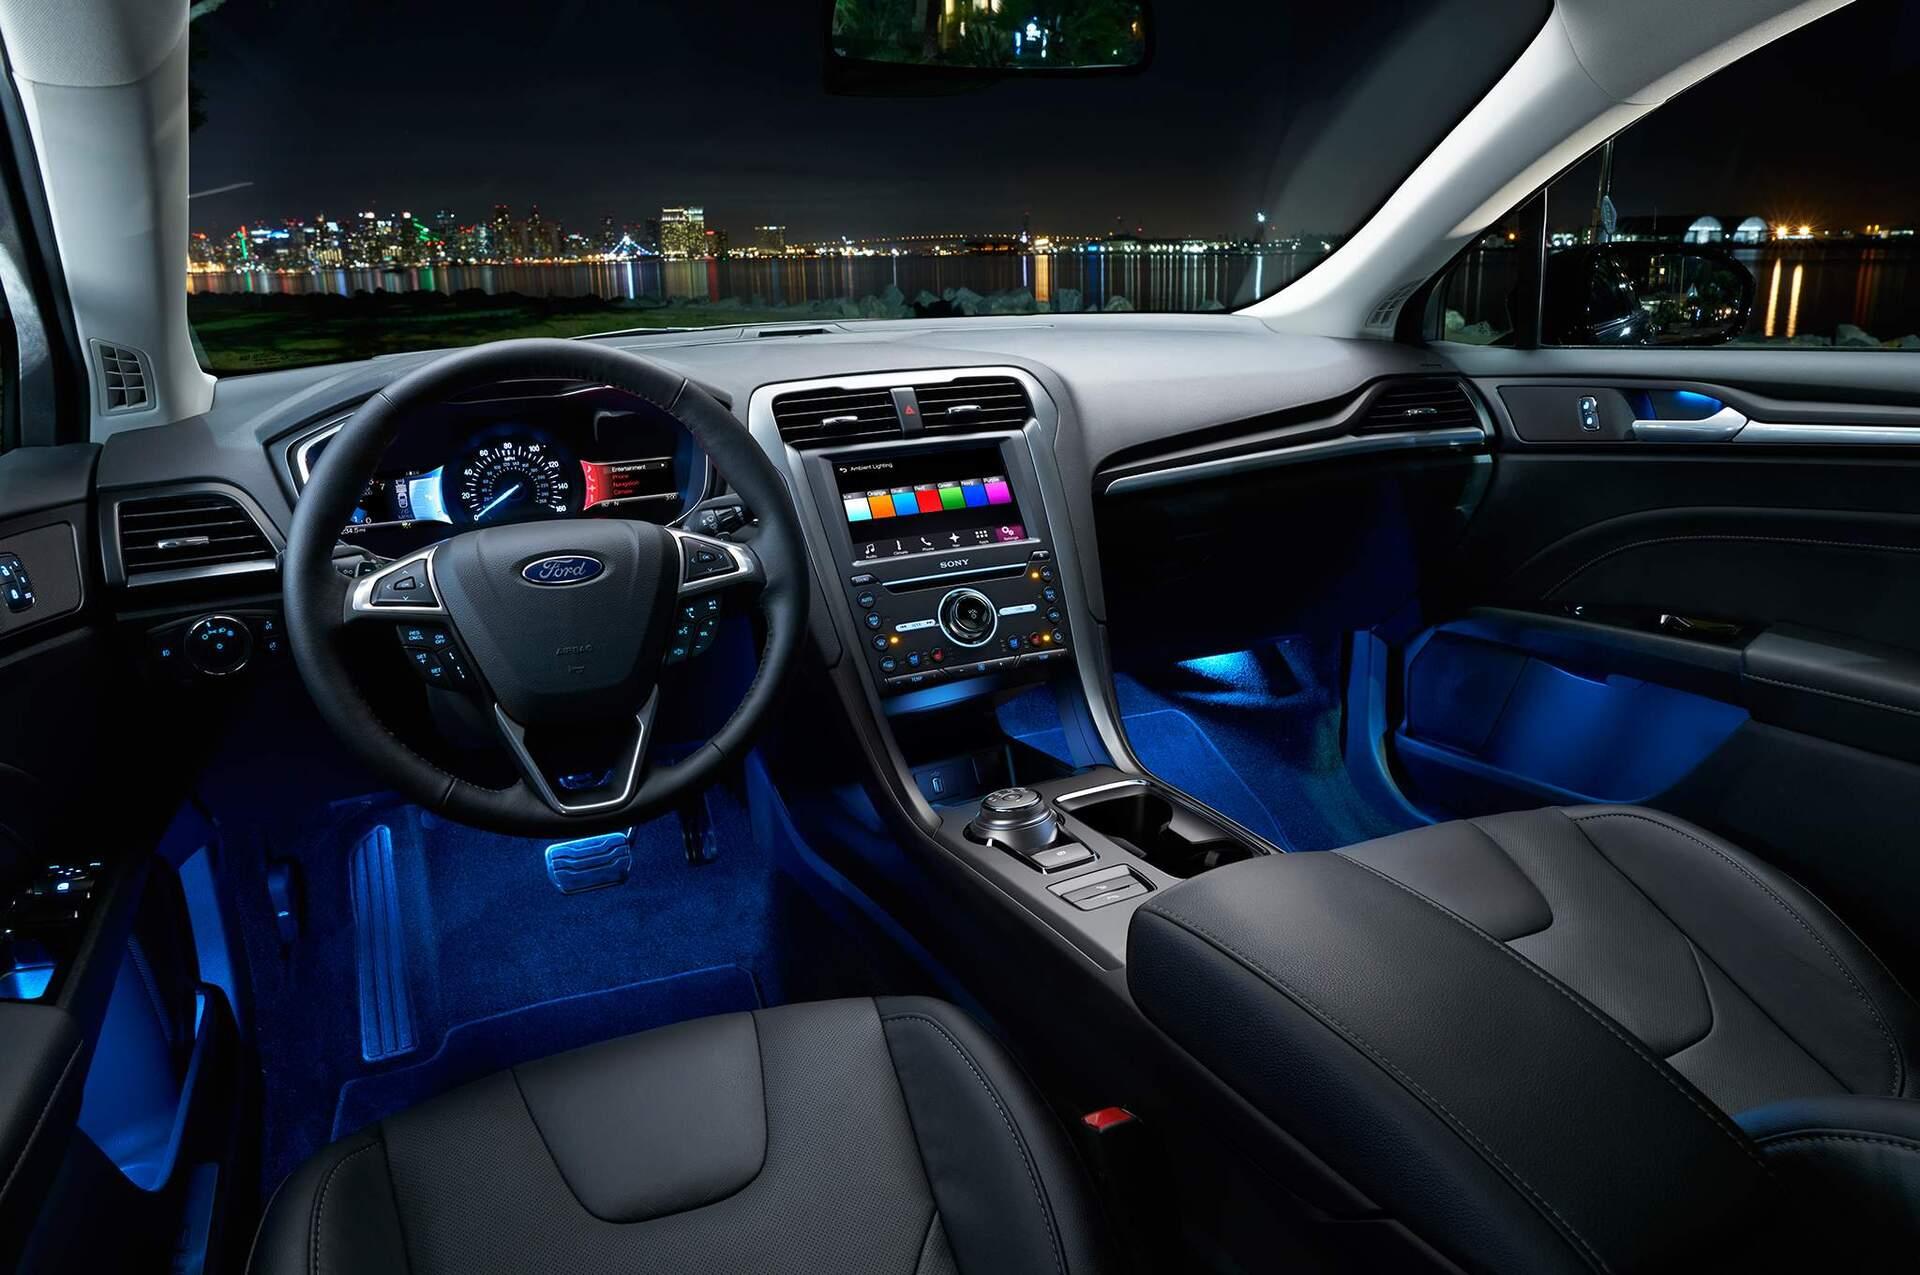 fusion & Ford Dealership Sheboygan WI   Used Cars Dick Brantmeier markmcfarlin.com